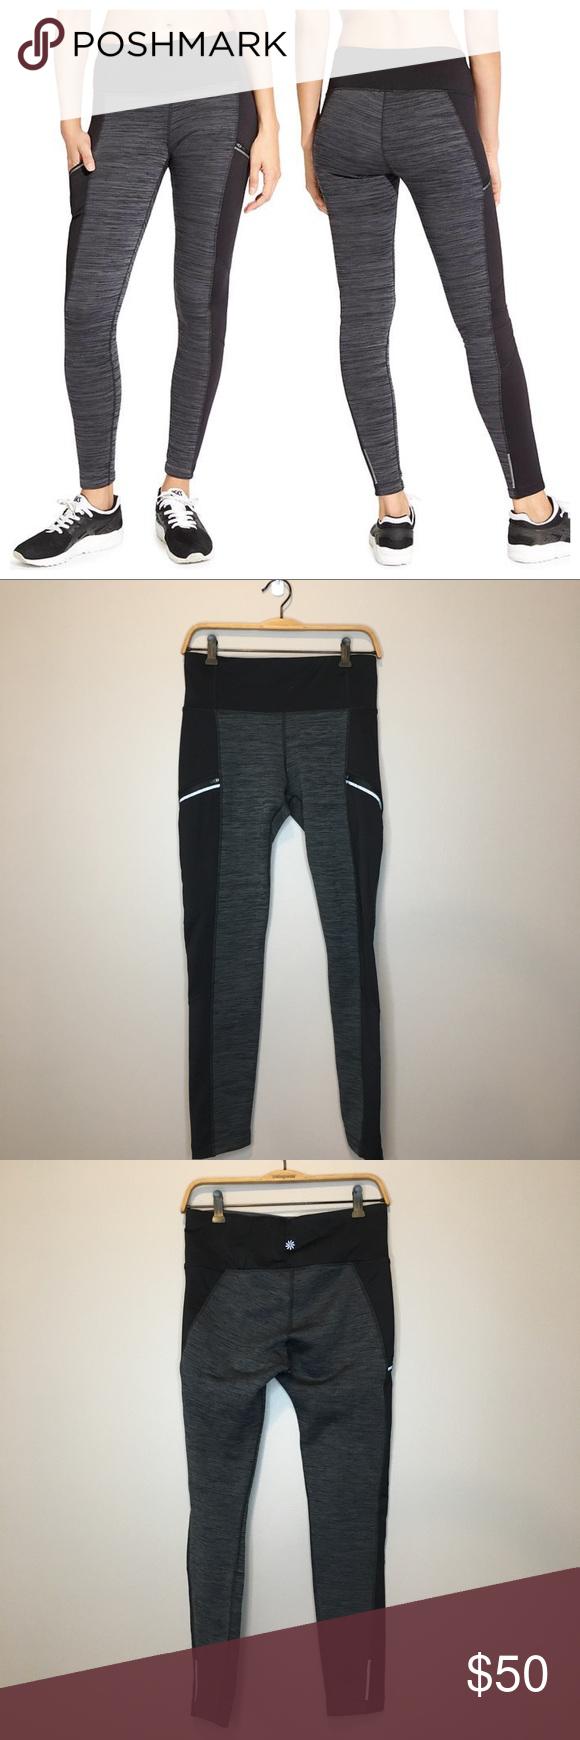 d7f7ce7aa62a9b Athleta Powerlift Tight 2.0 - Fleece Lined Pants Like new Athleta Powerlift  Tight 2.0 in size medium. Black and gray fleece lined pants.